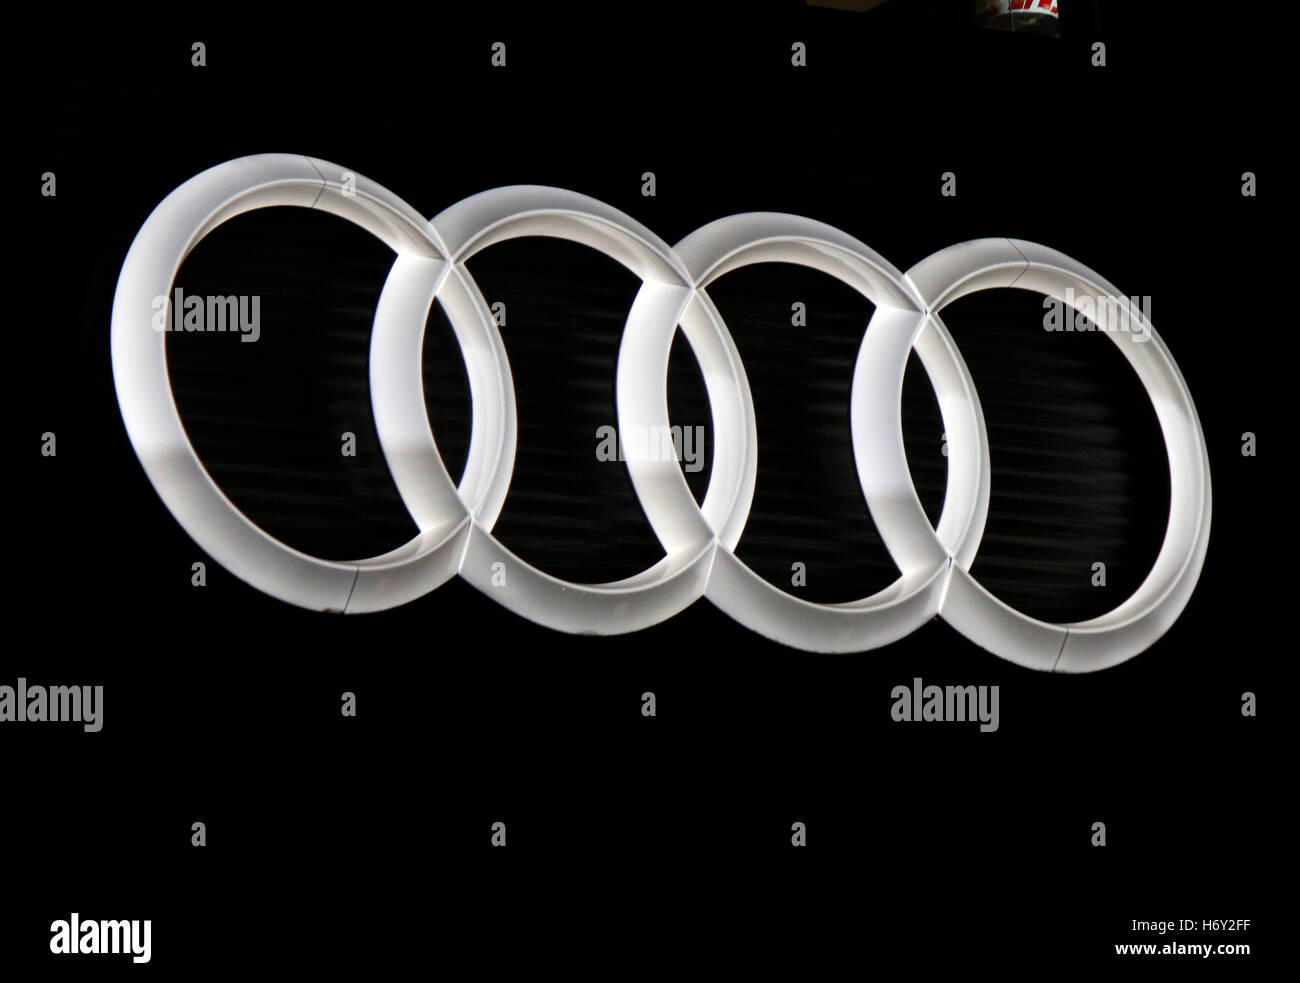 das Logo der Marke 'Audi', Berlin. - Stock Image